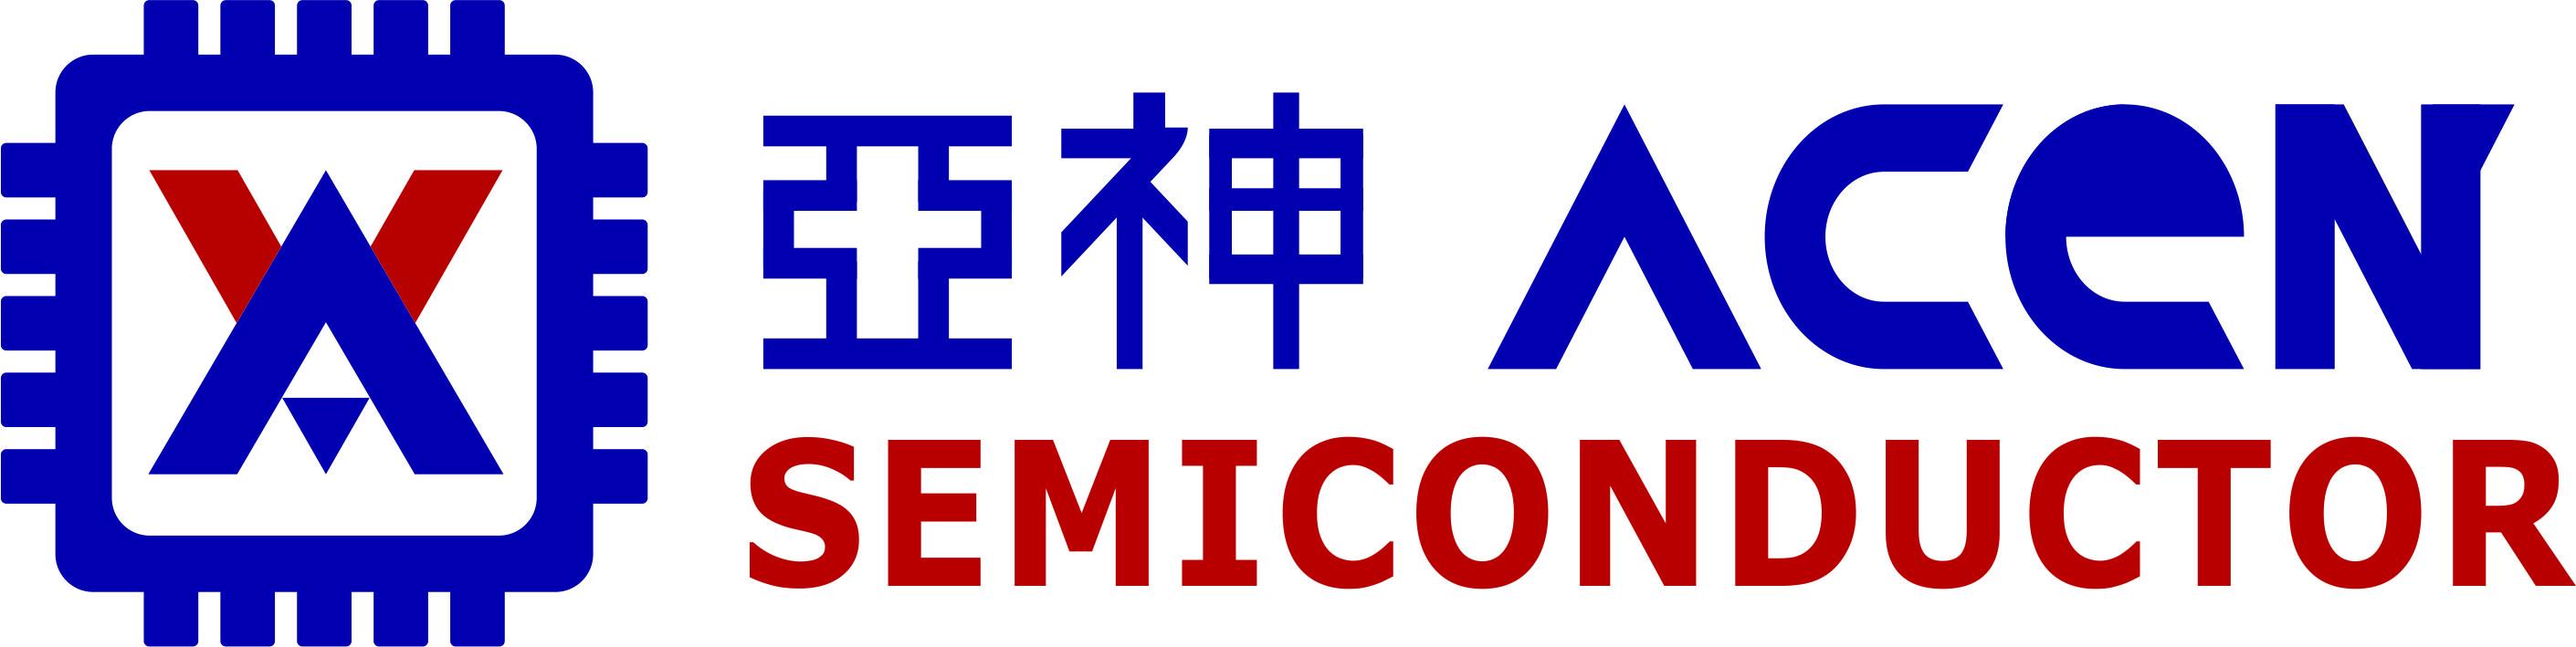 Acen Semicon